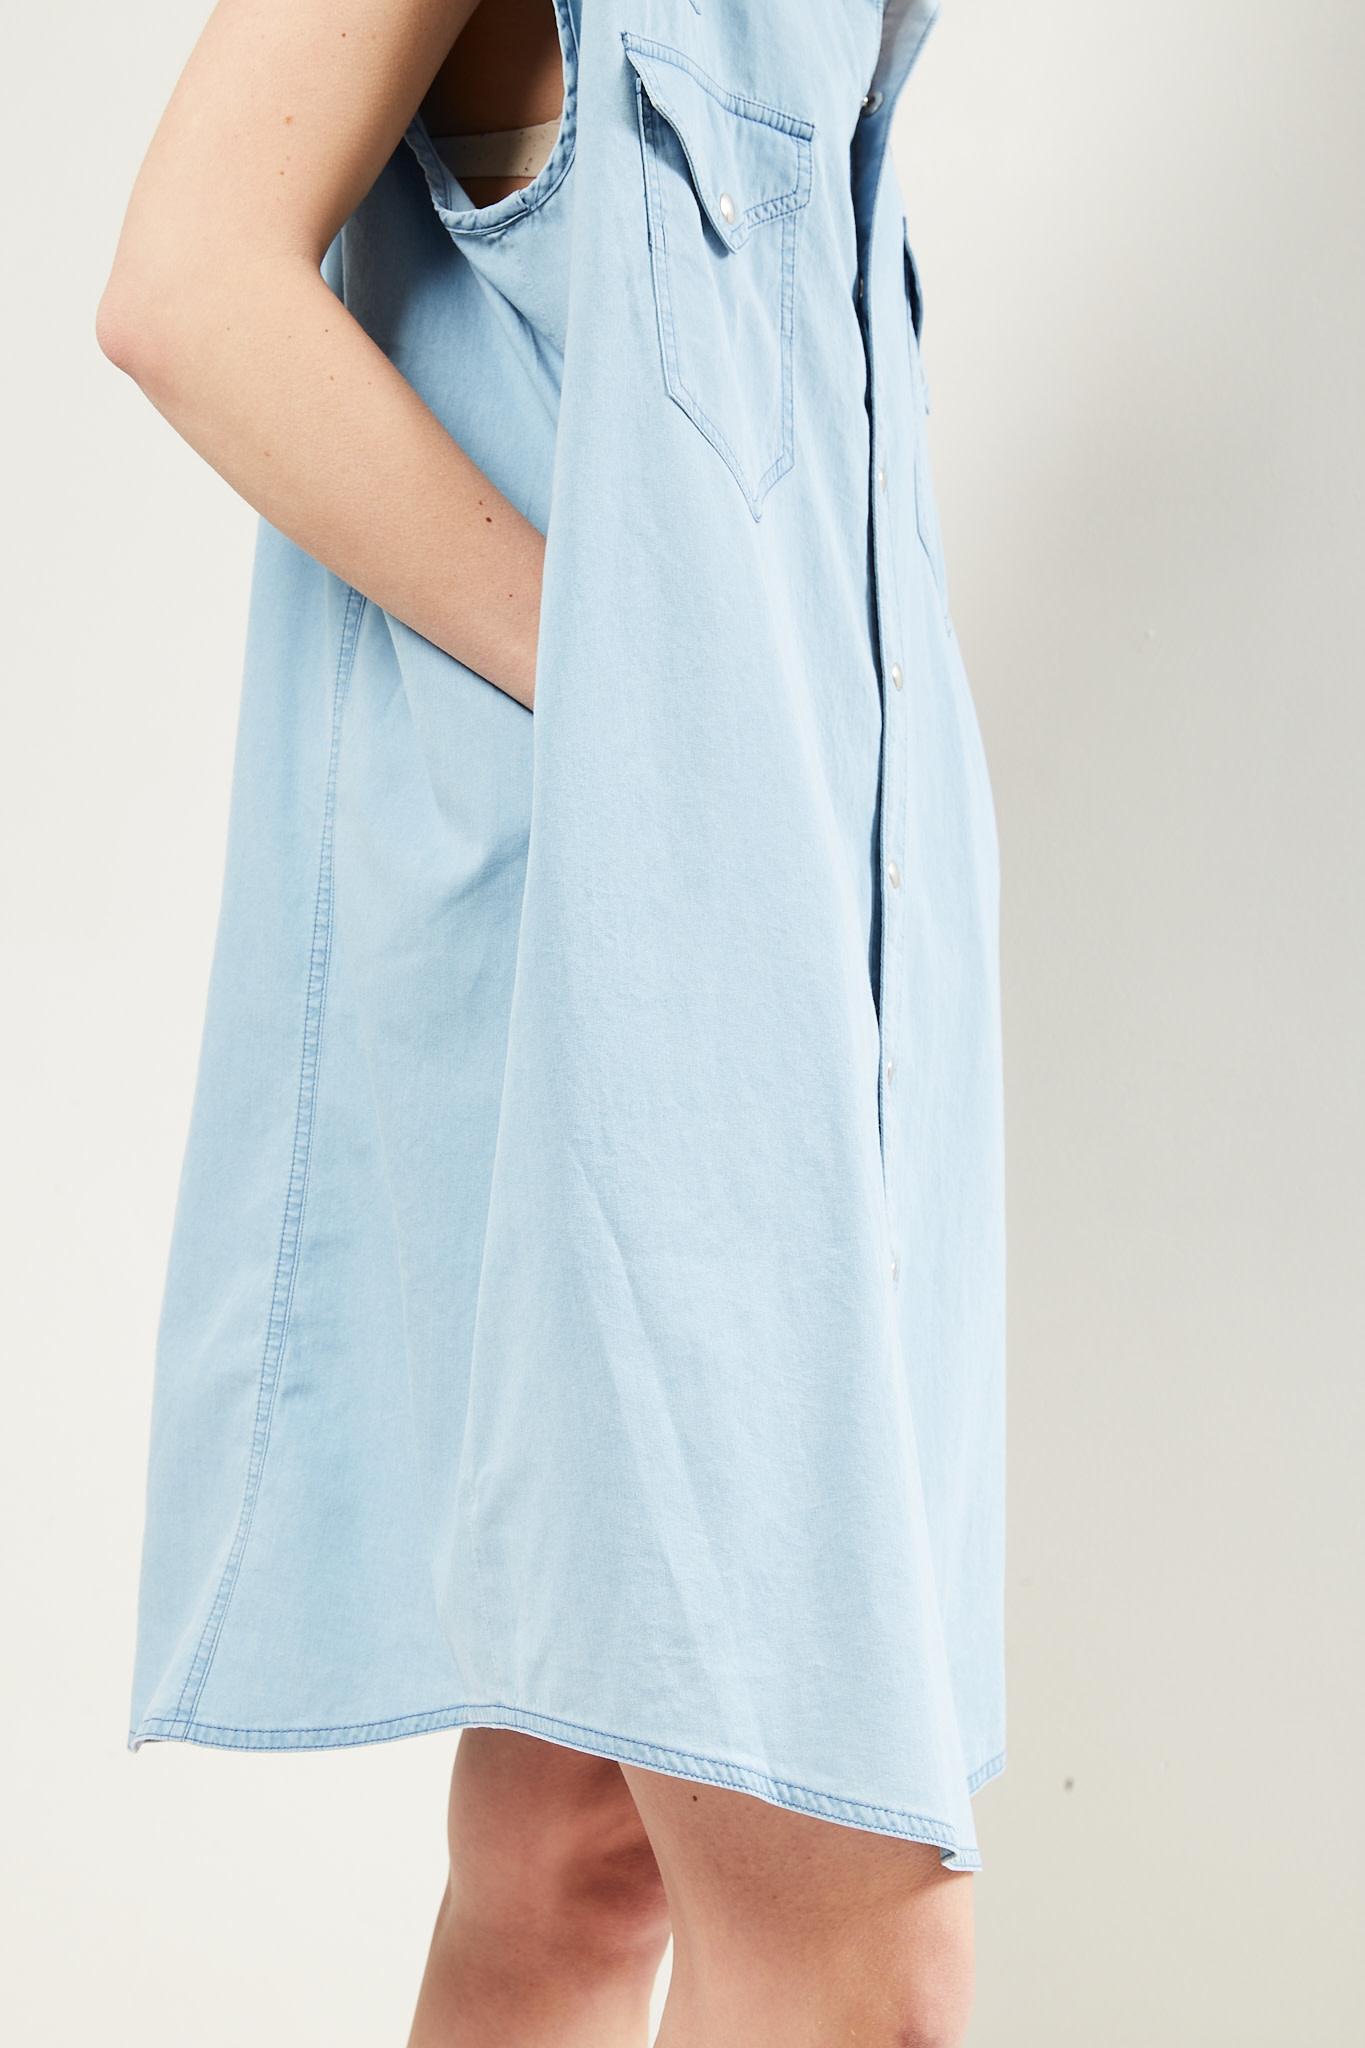 Facon Jacmīn - Glory oversized shirt dress